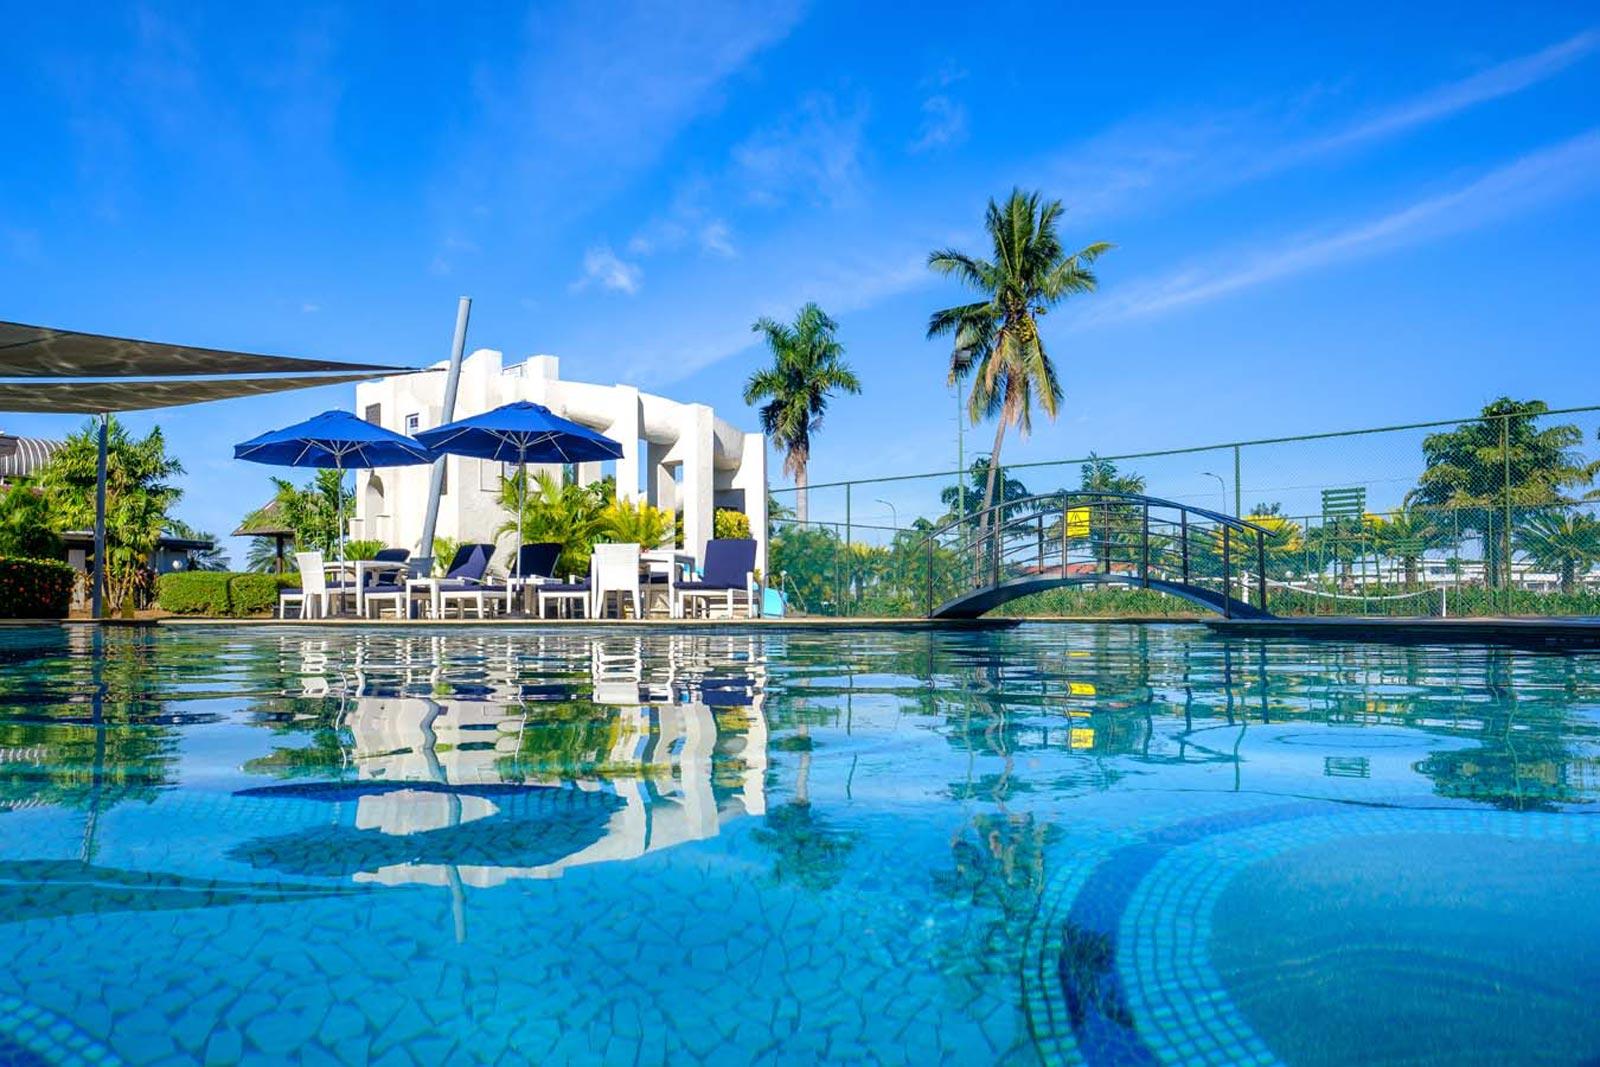 10 Best Wedding & Honeymoon Resorts in Nadi